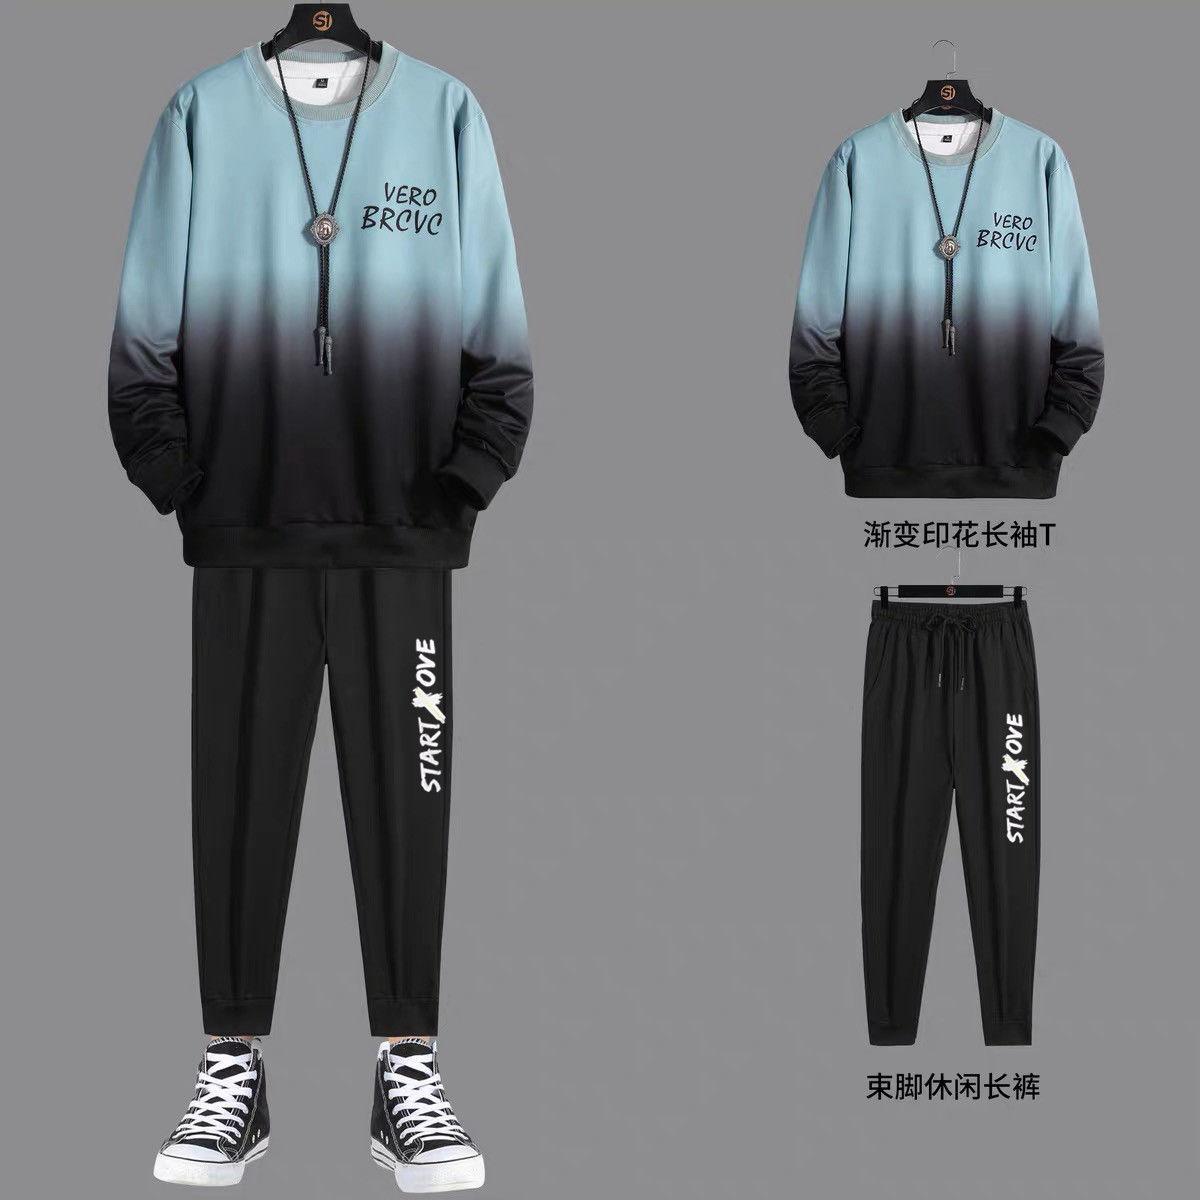 2021 Large MEN S Sweater Spring Summer Tide Brand Sports Student Coat Gradient Top